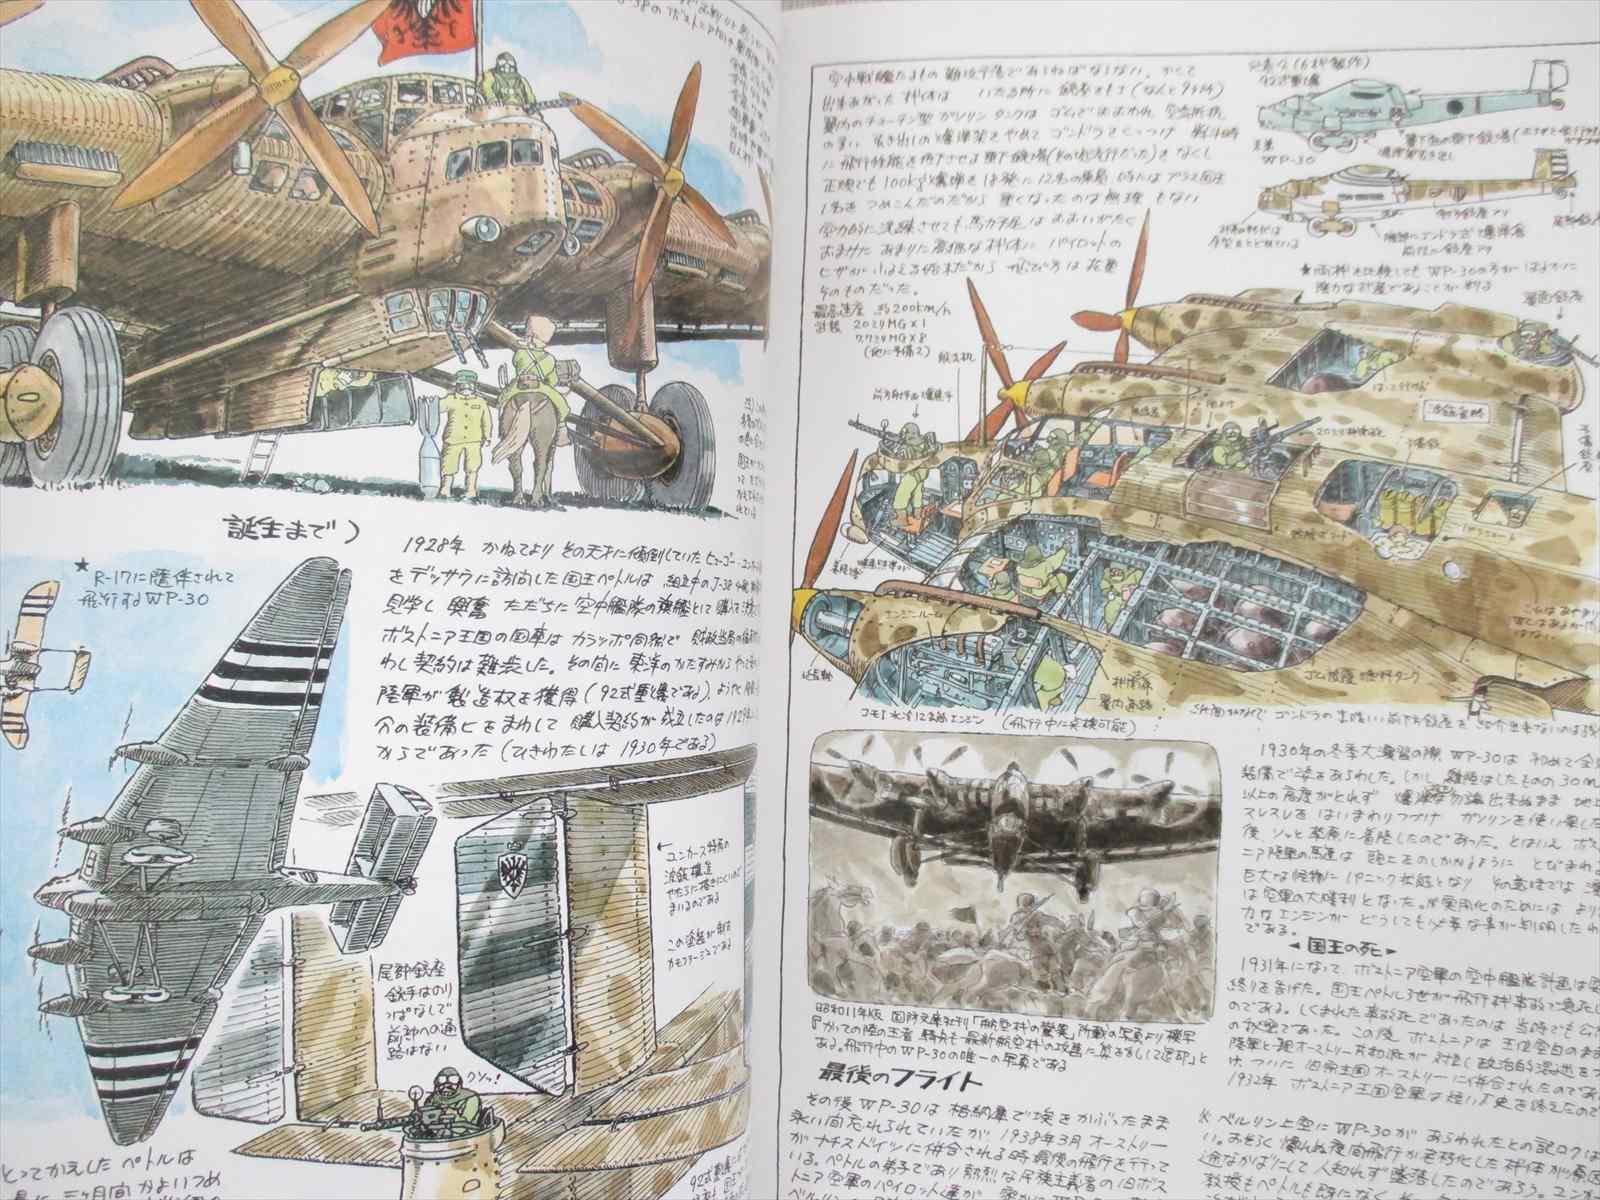 HAYAO MIYAZAKI Daydream Data Note ZASSO NOTE Zassou 1992 Art Works Book Ghibli